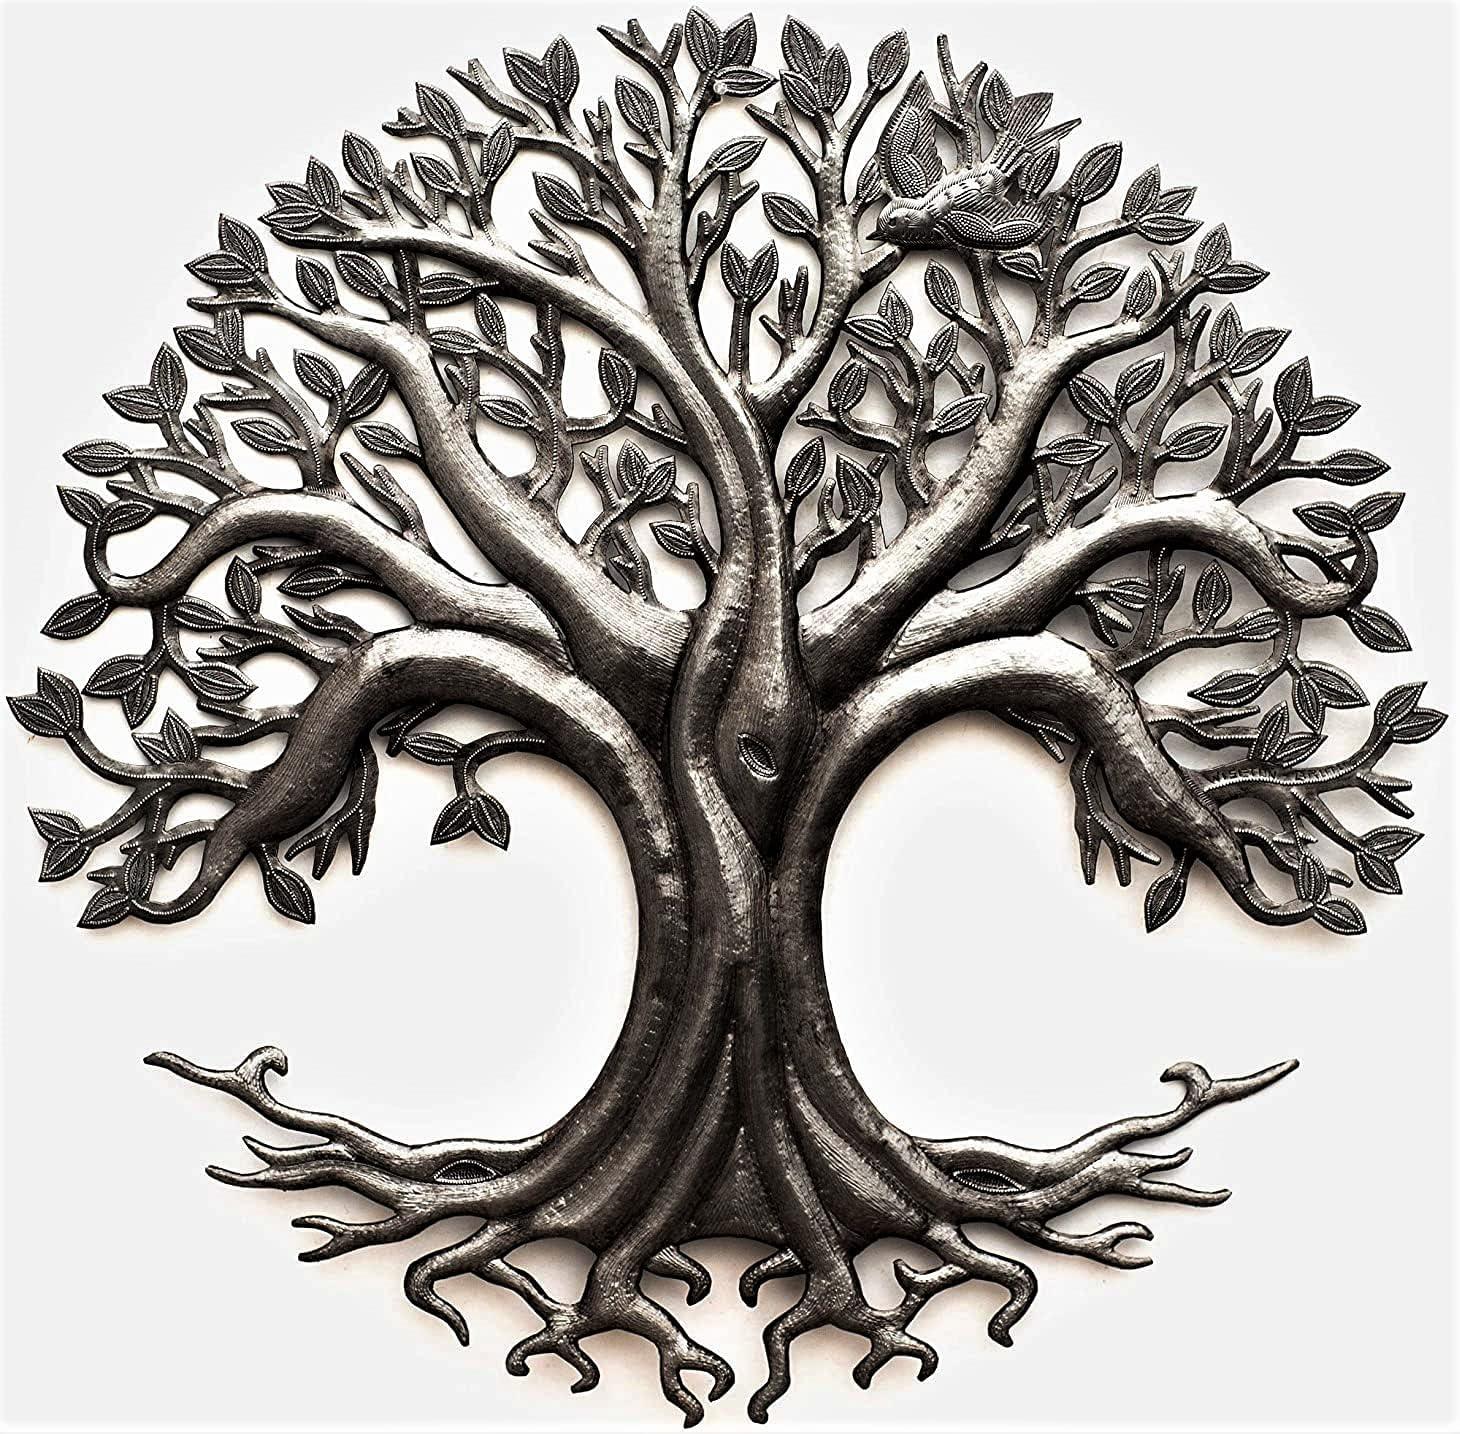 Tree of Life, Garden Metal Plaque, Indoor and Outdoor Wall Décor 23 Inches Round Haitian Art